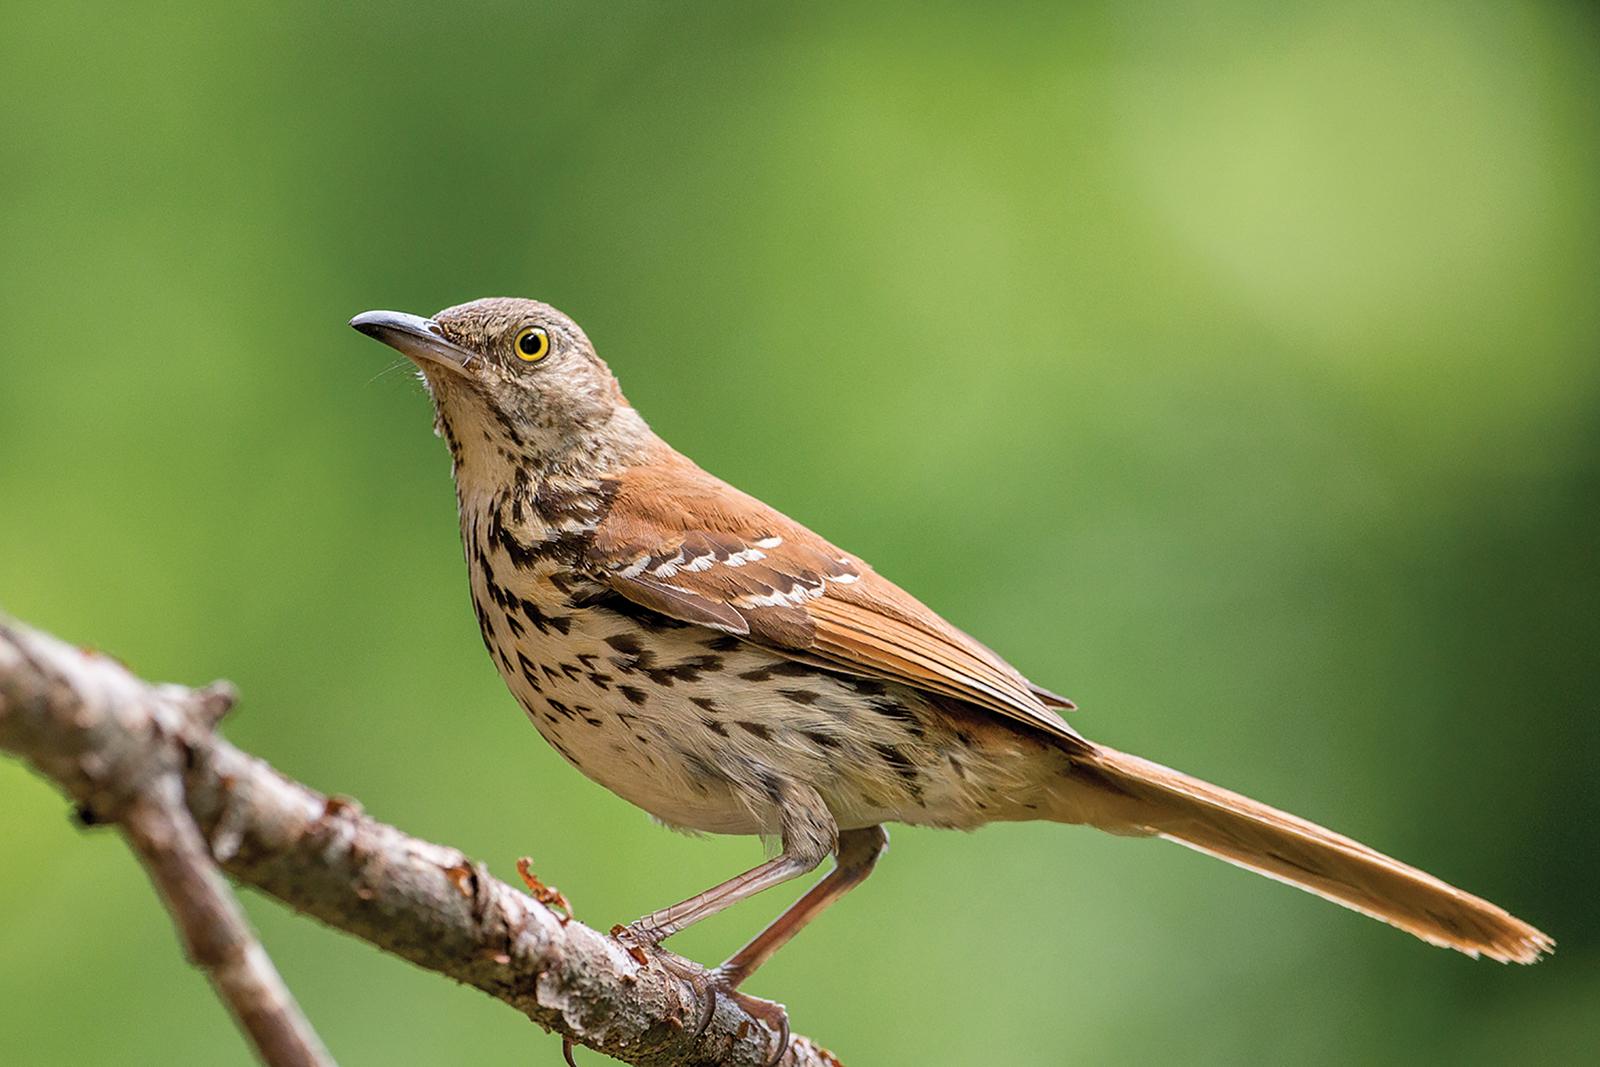 Brown_Thrasher_audubon_society_highlands_nc